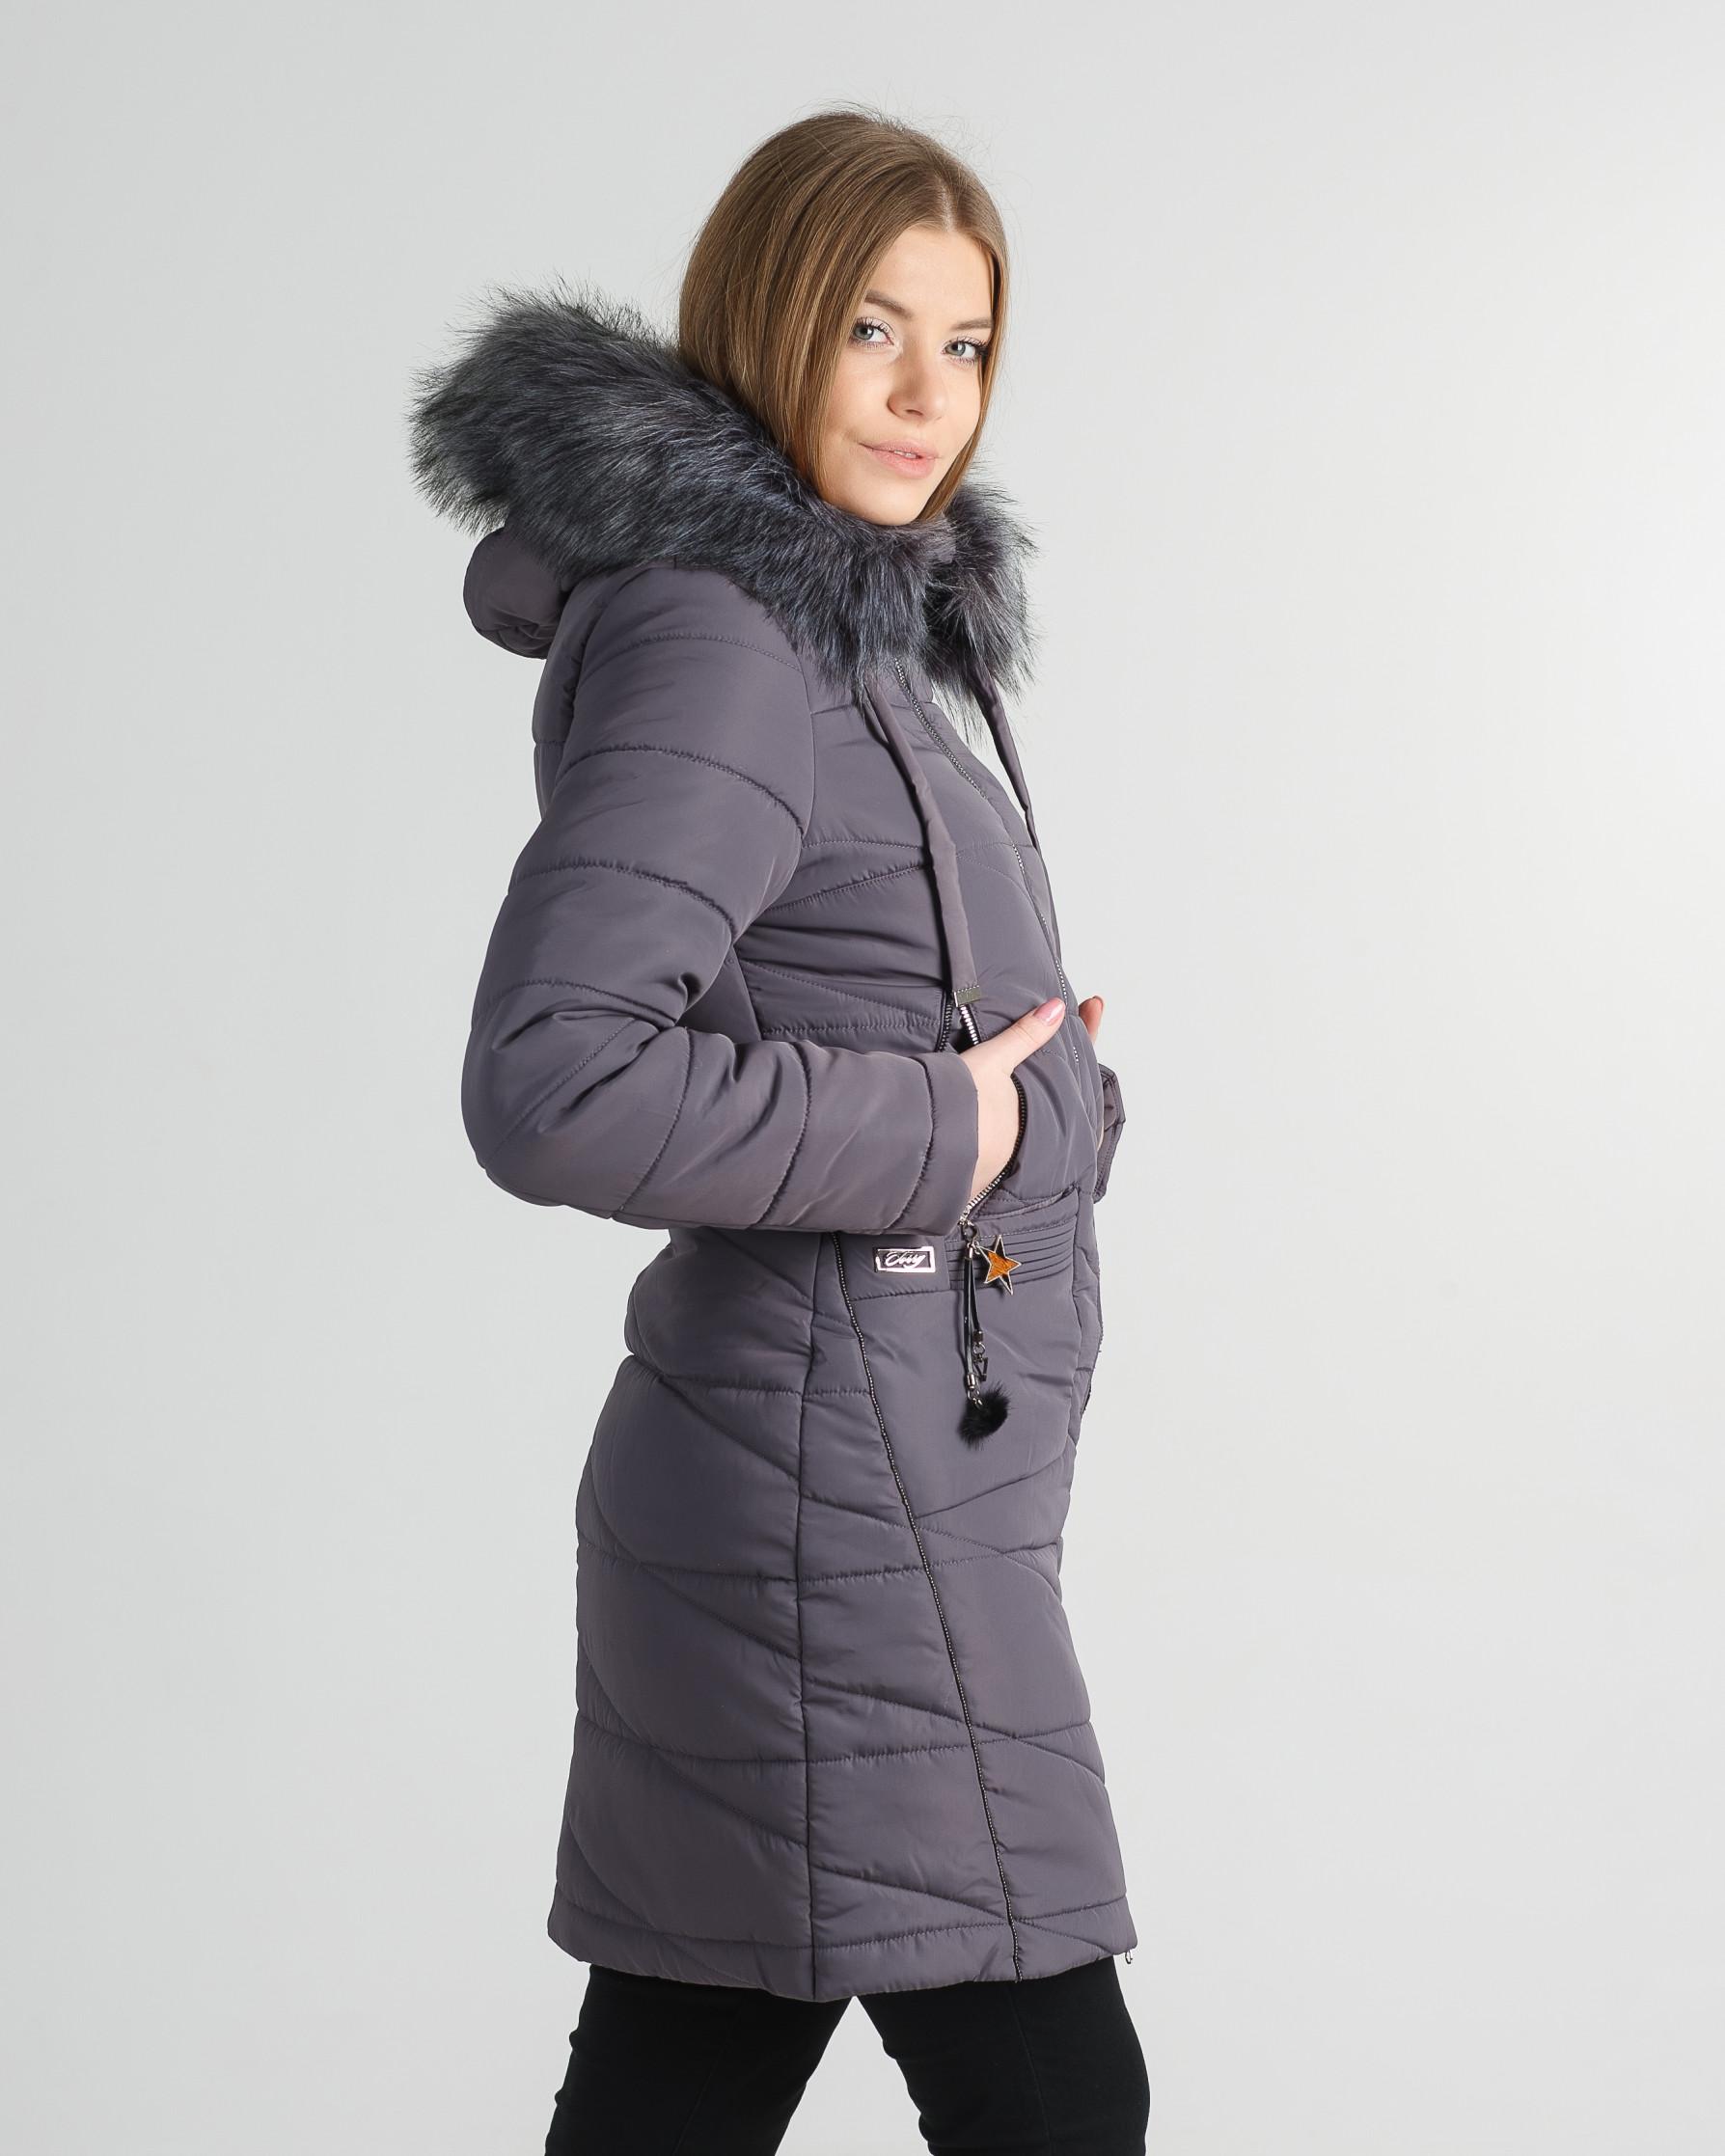 Зимнее пальто Руся капучино